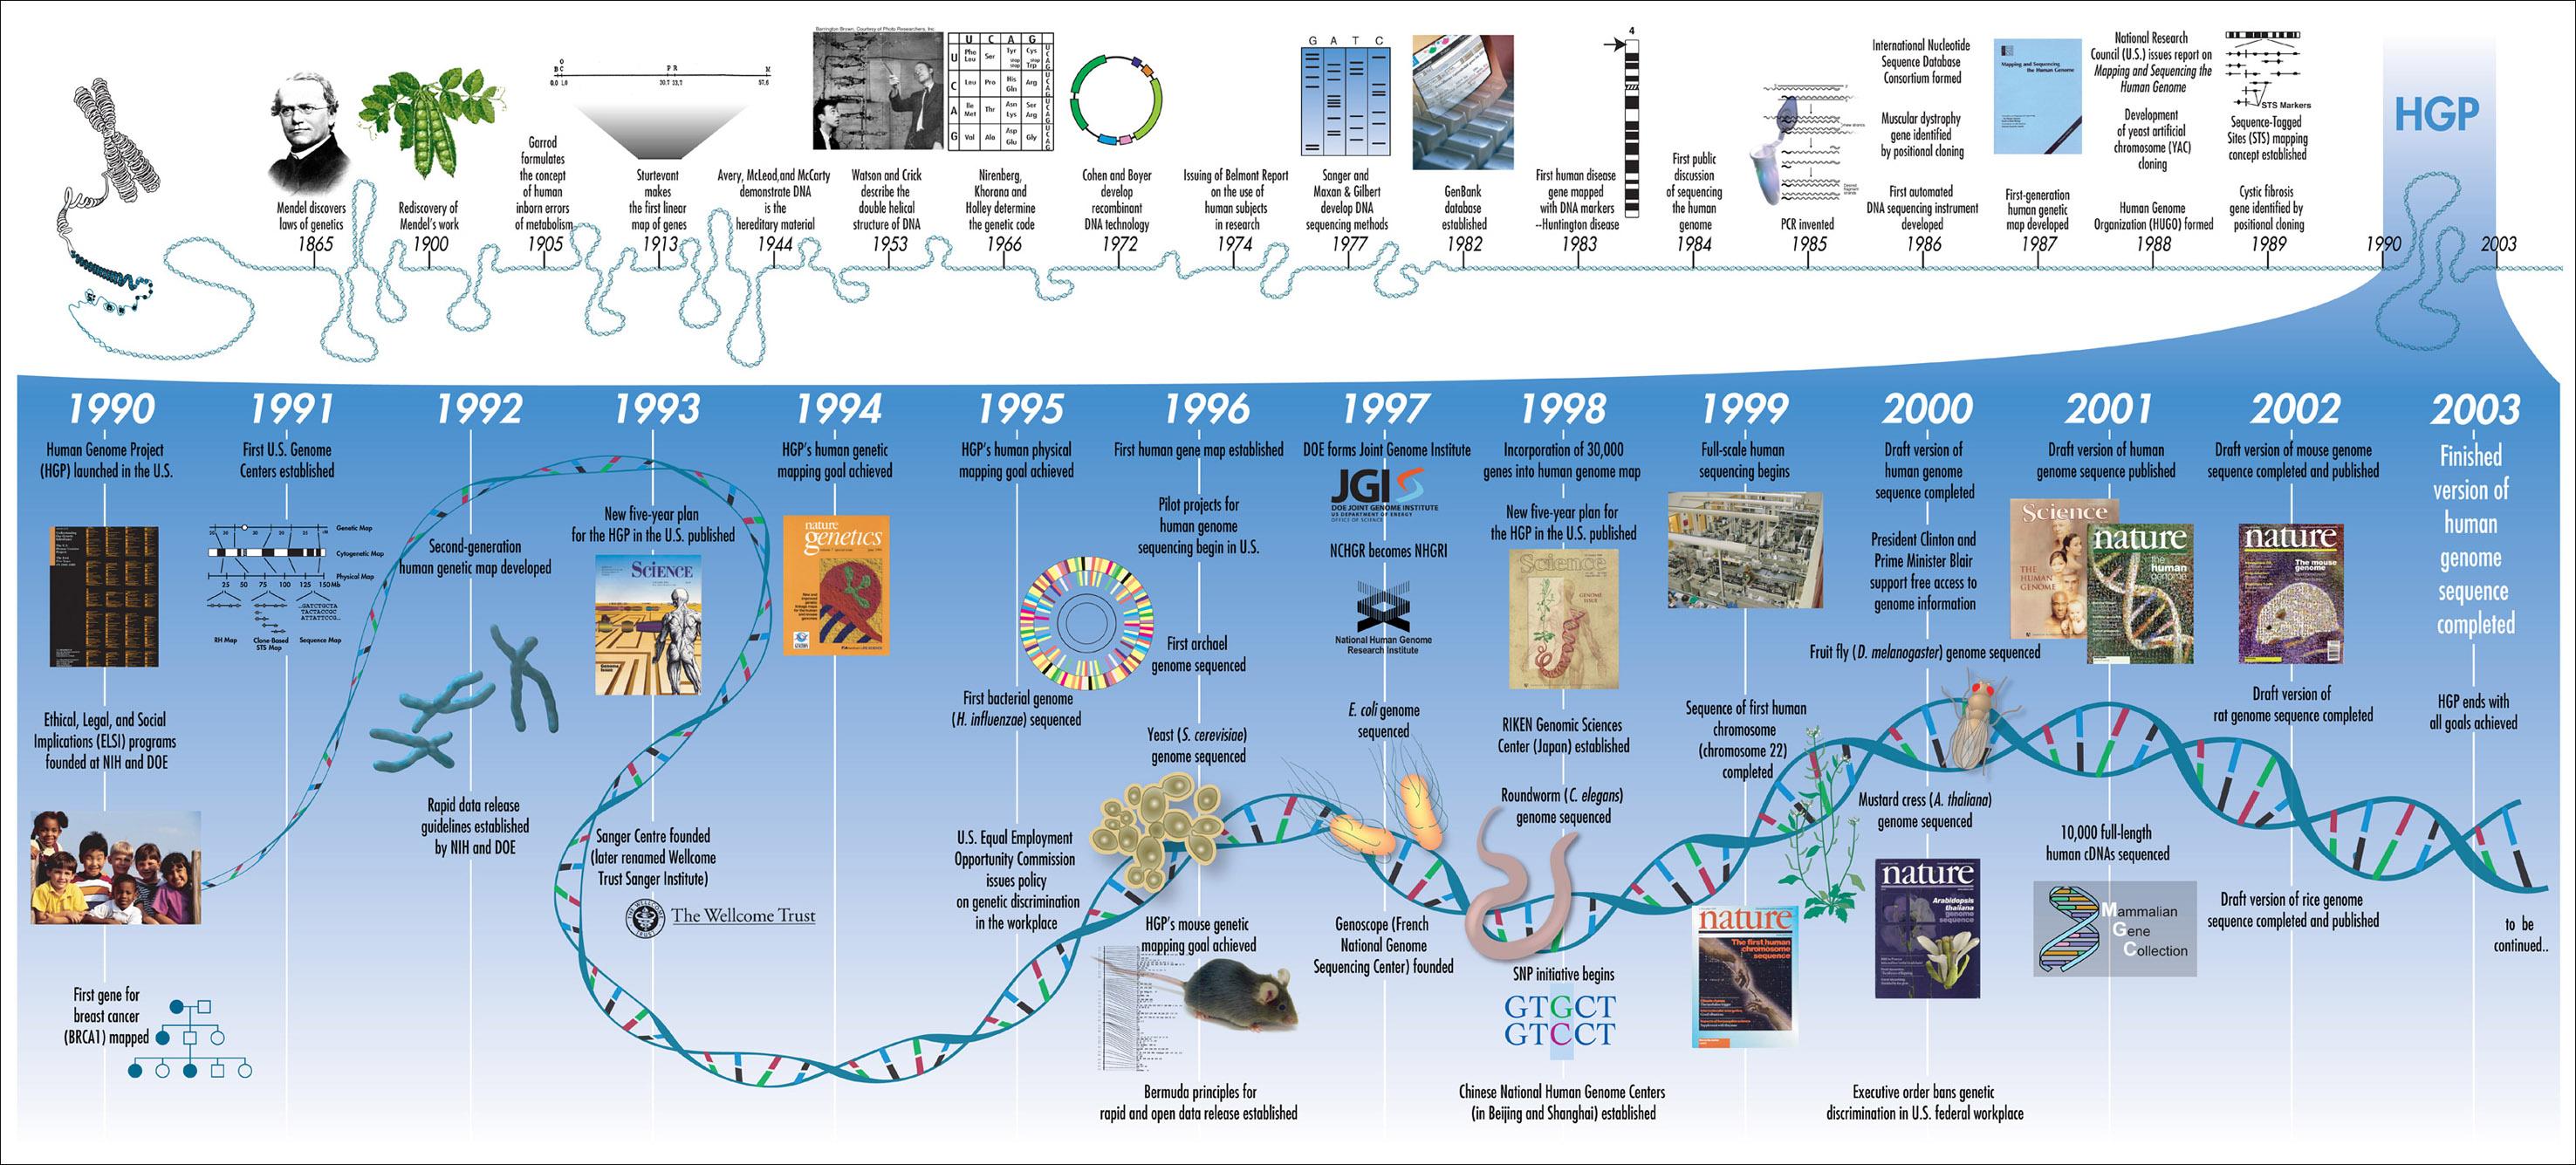 El genoma humano #infografia #infogrpahic | Las otras ...